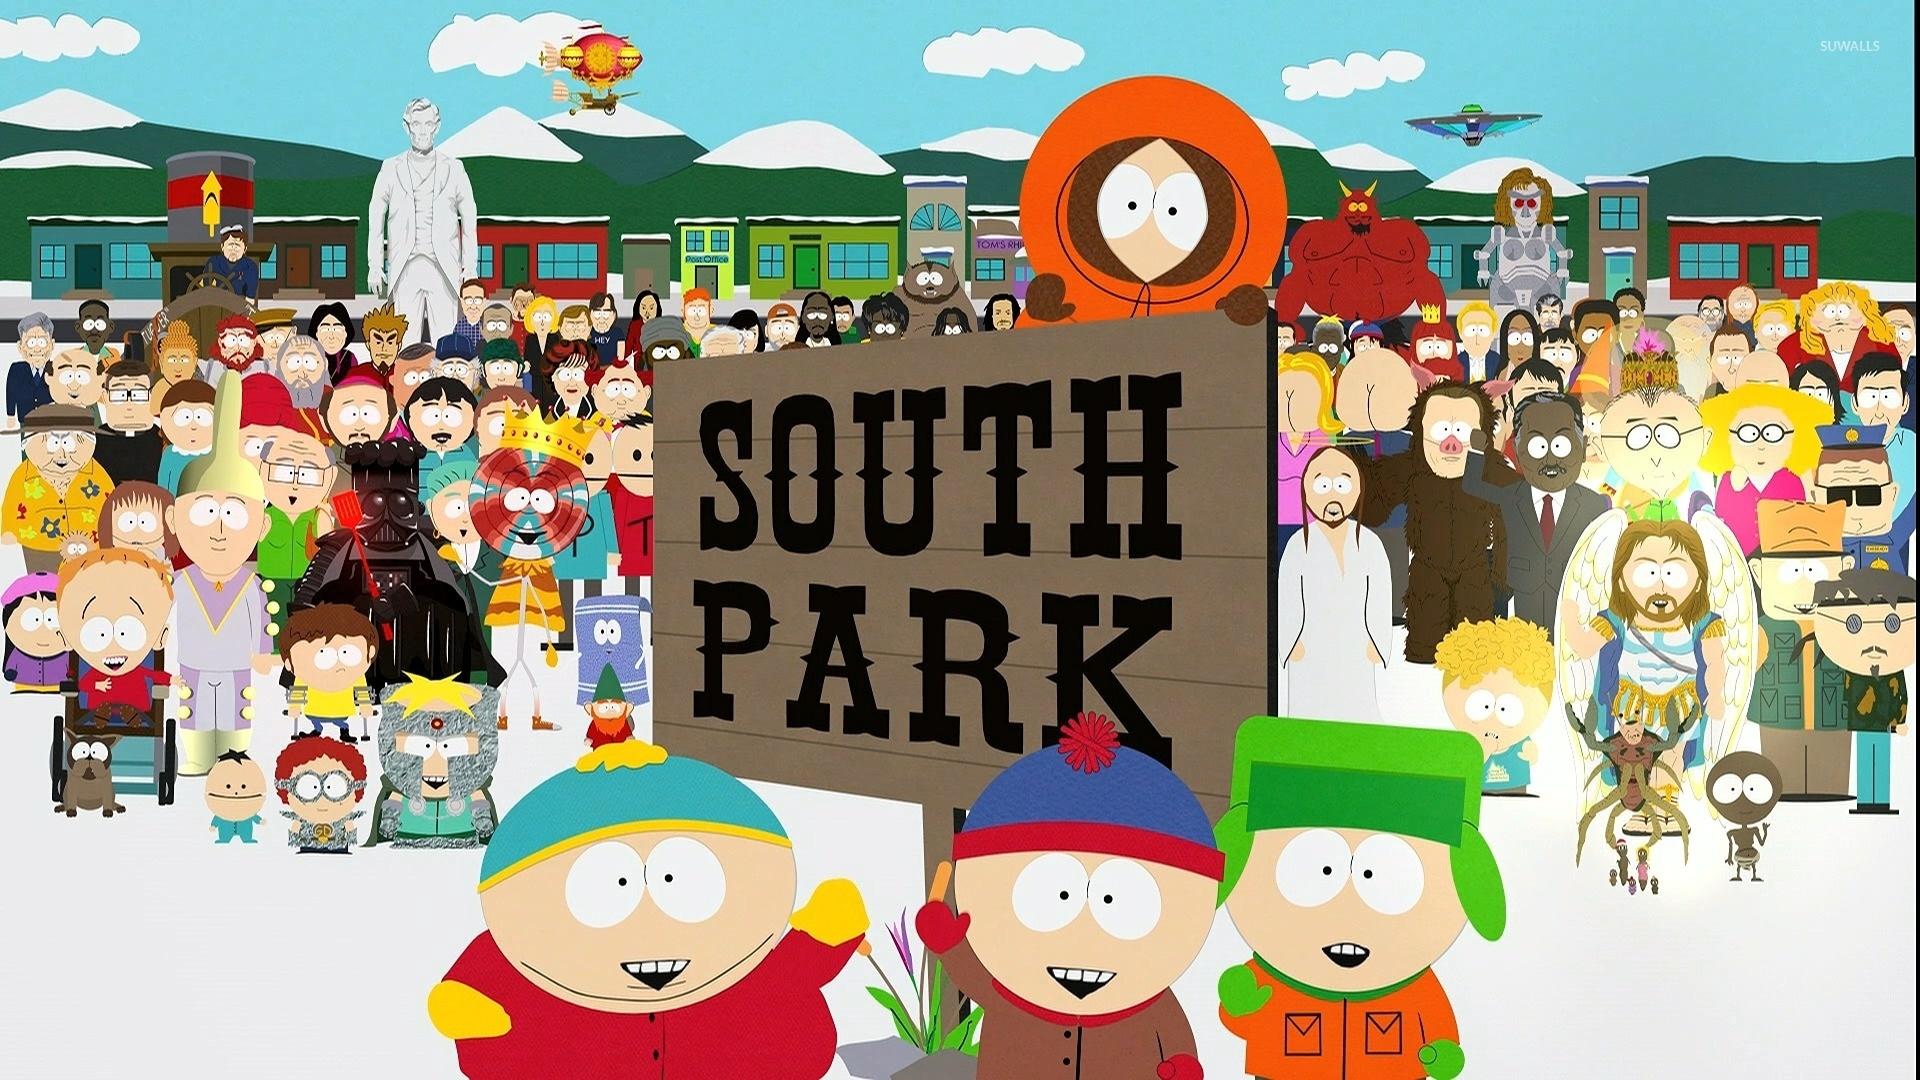 South Park desktop wallpaper free download